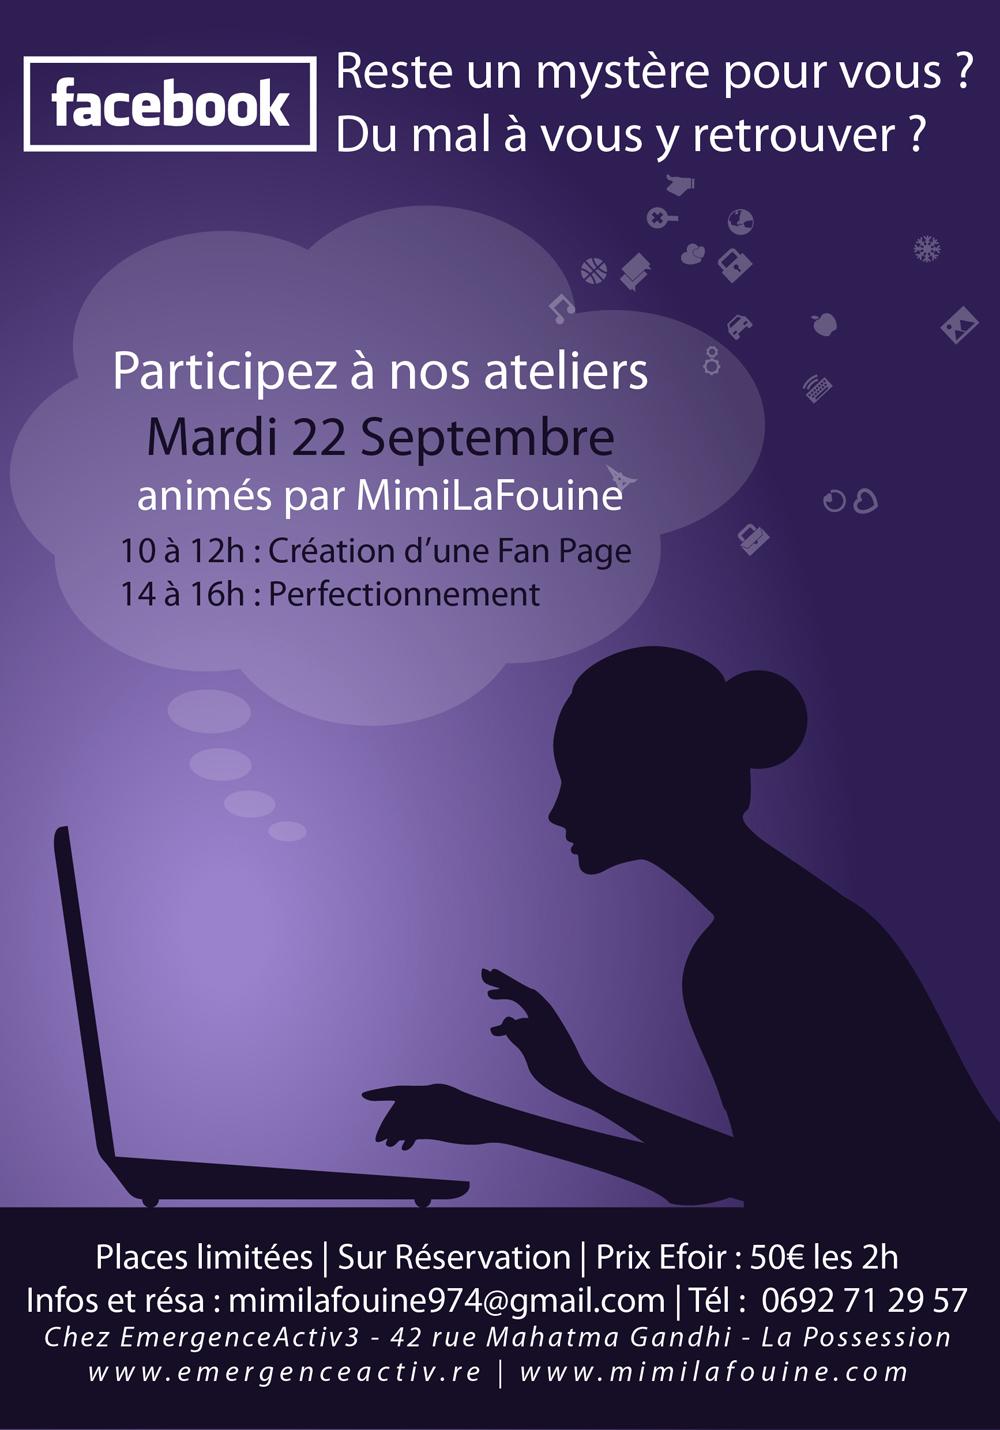 Ateliers Facebook| 22 septembre 2015